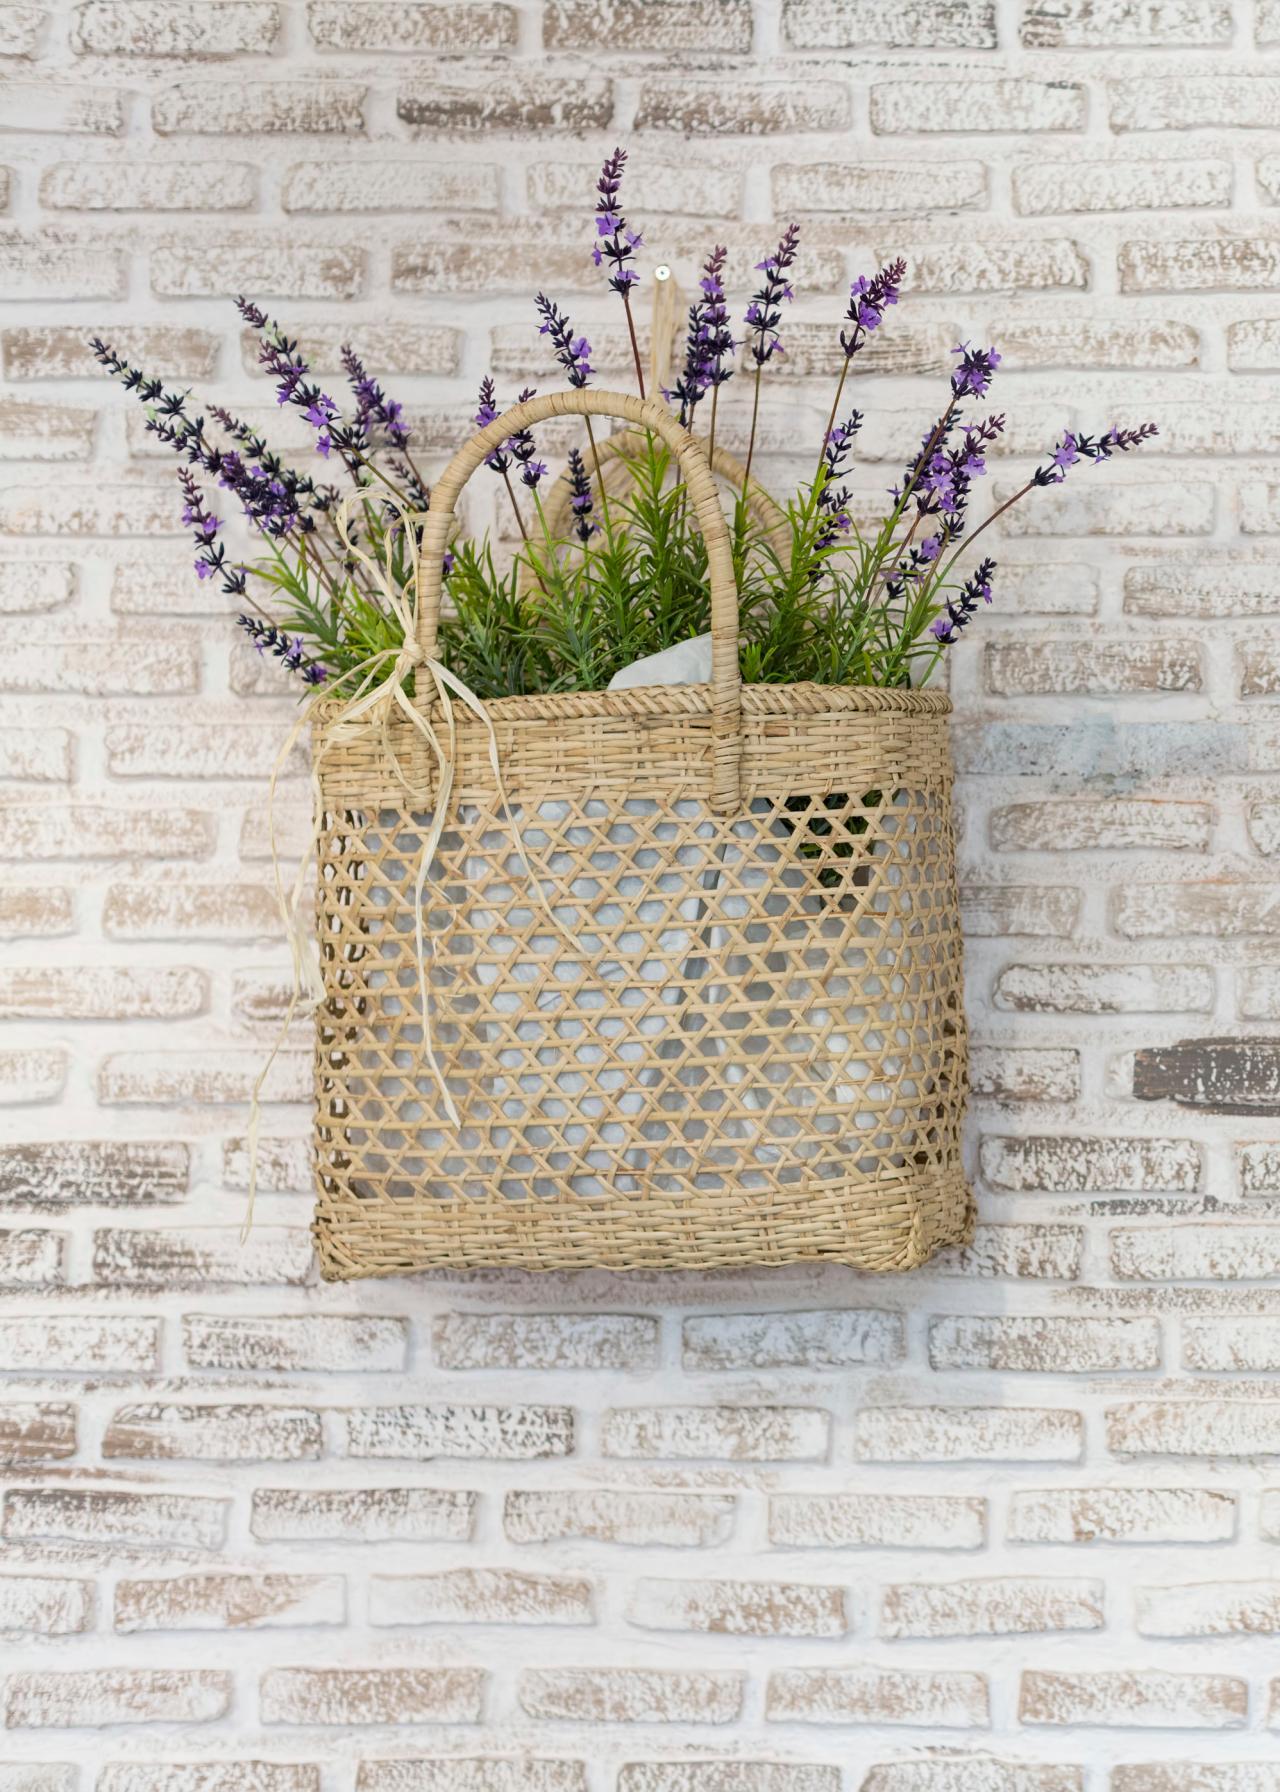 10 Fall Door Decorations That Arent Wreaths Hgtvs Decorating